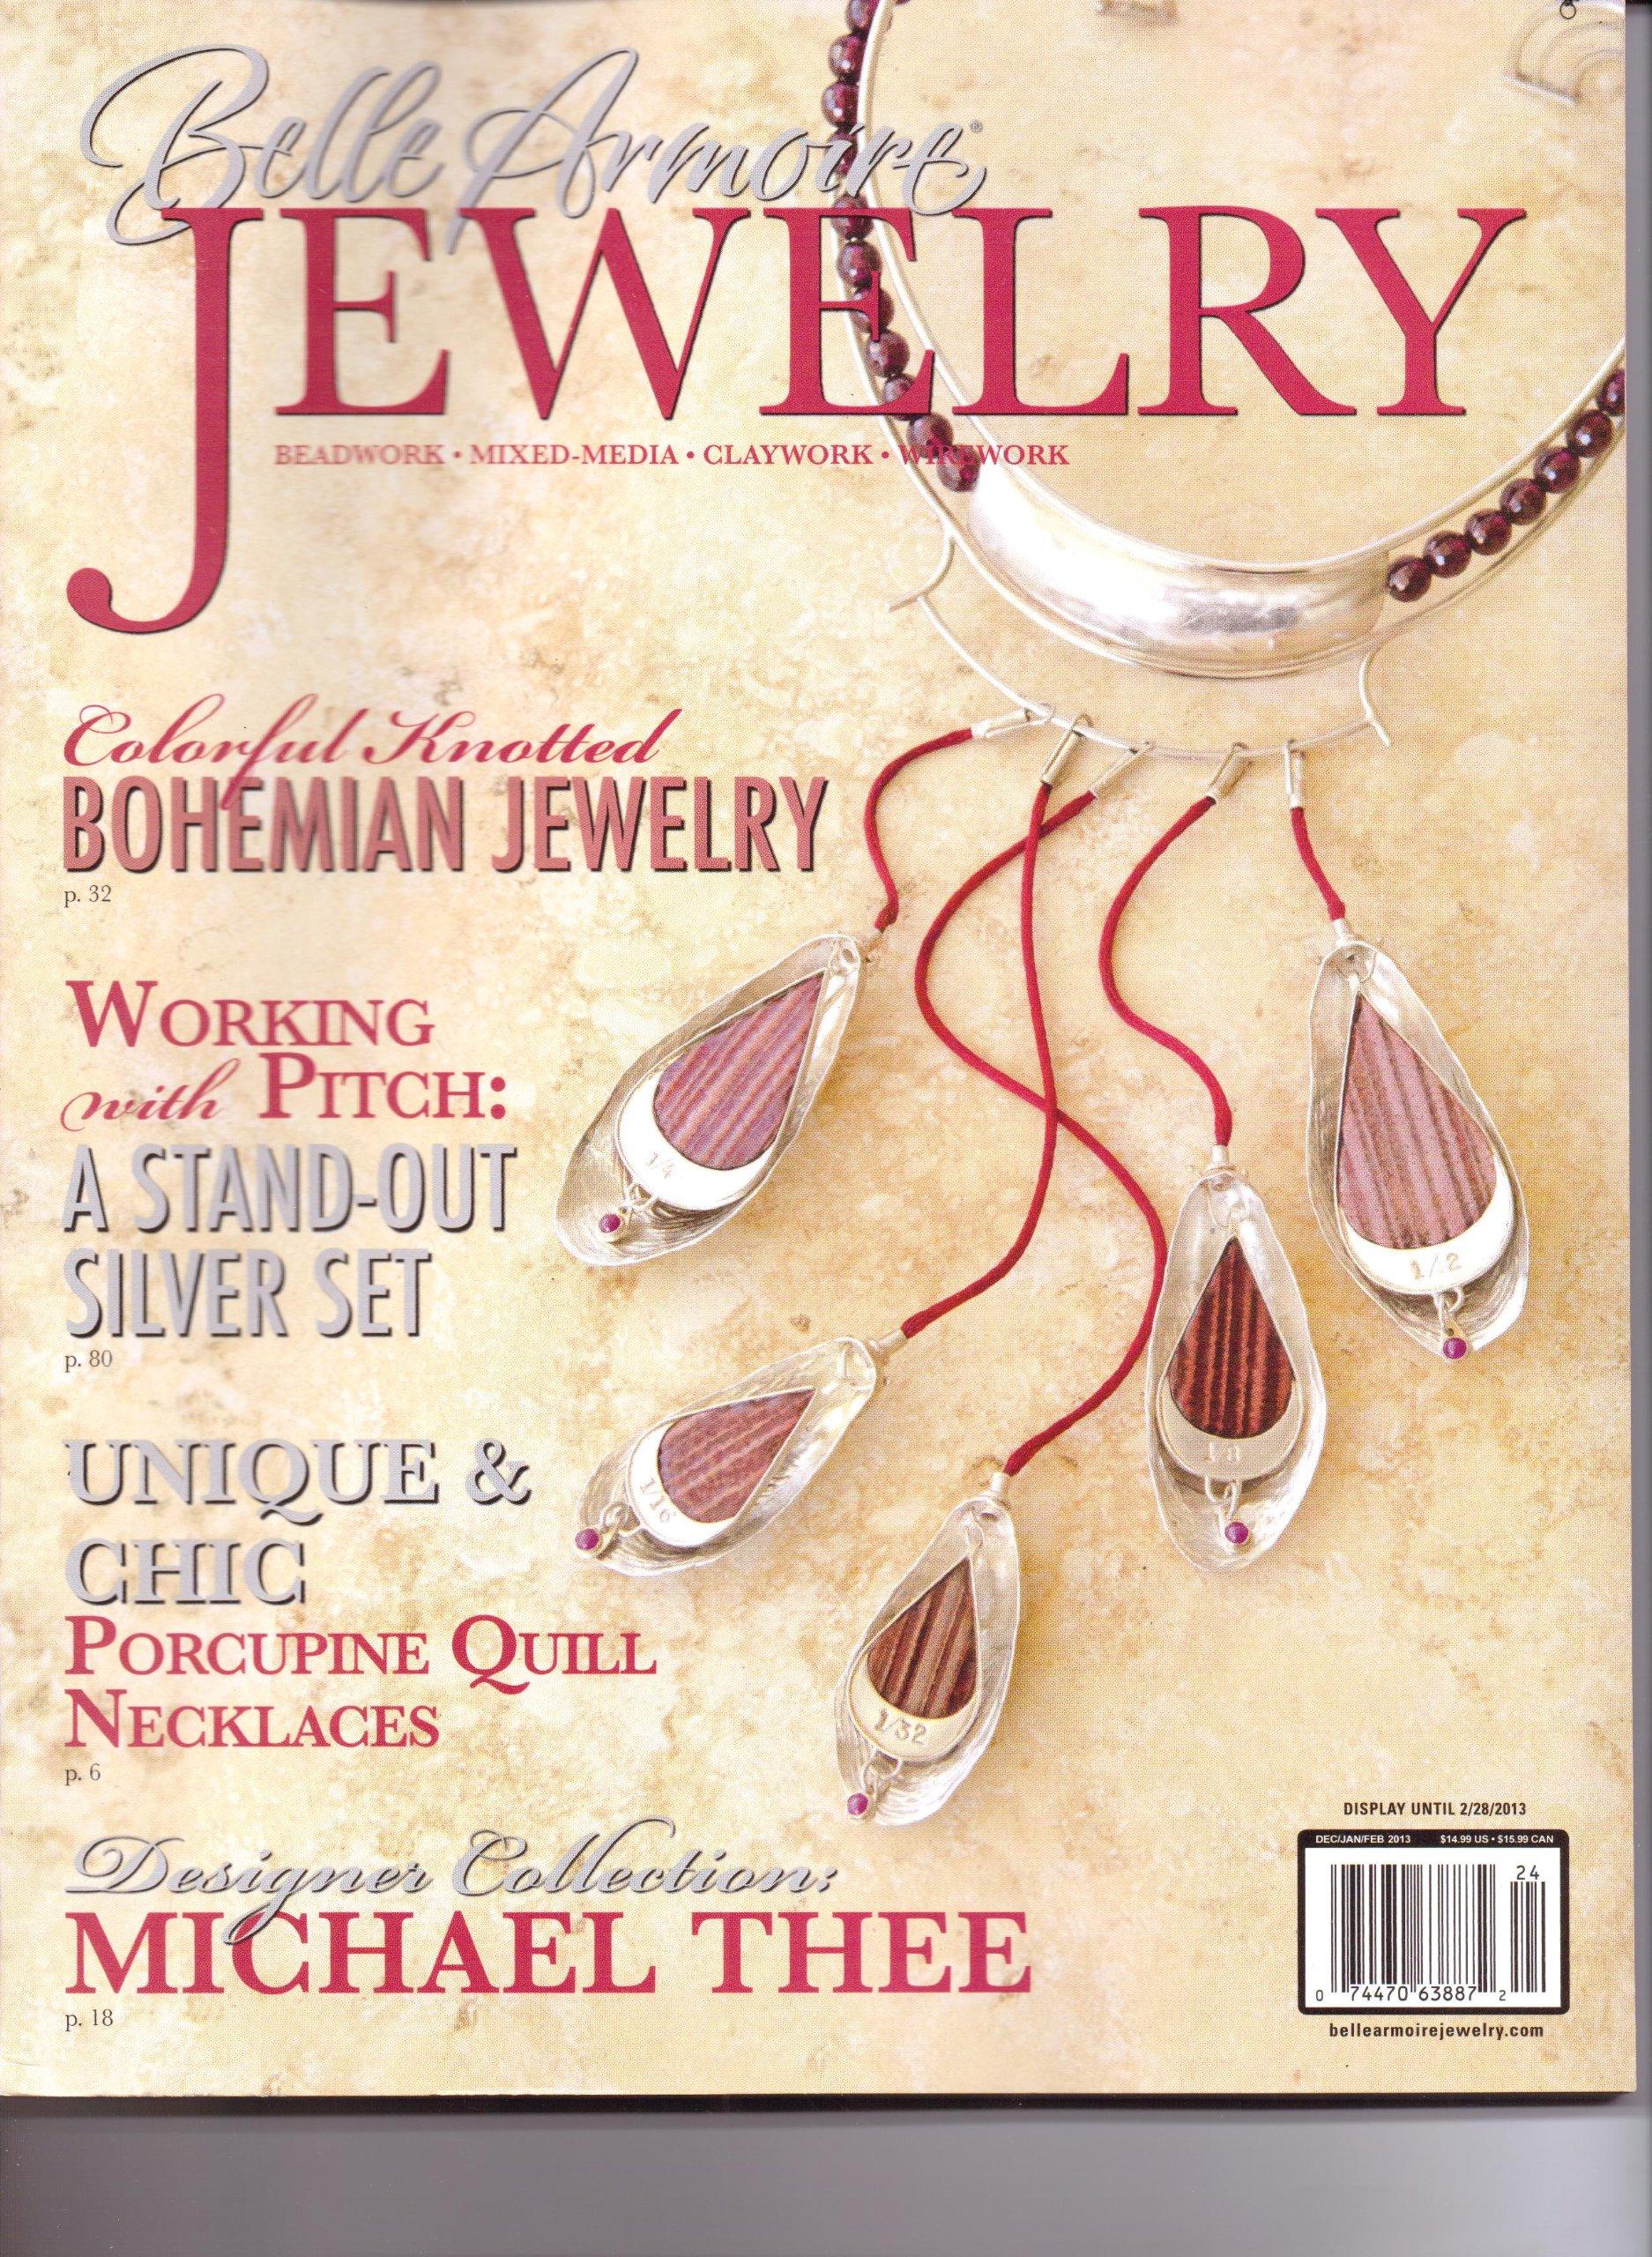 Belle Armoire JEWELRY Magazine. Vol 8. #4. Dce/Jan/Feb 2013. ebook